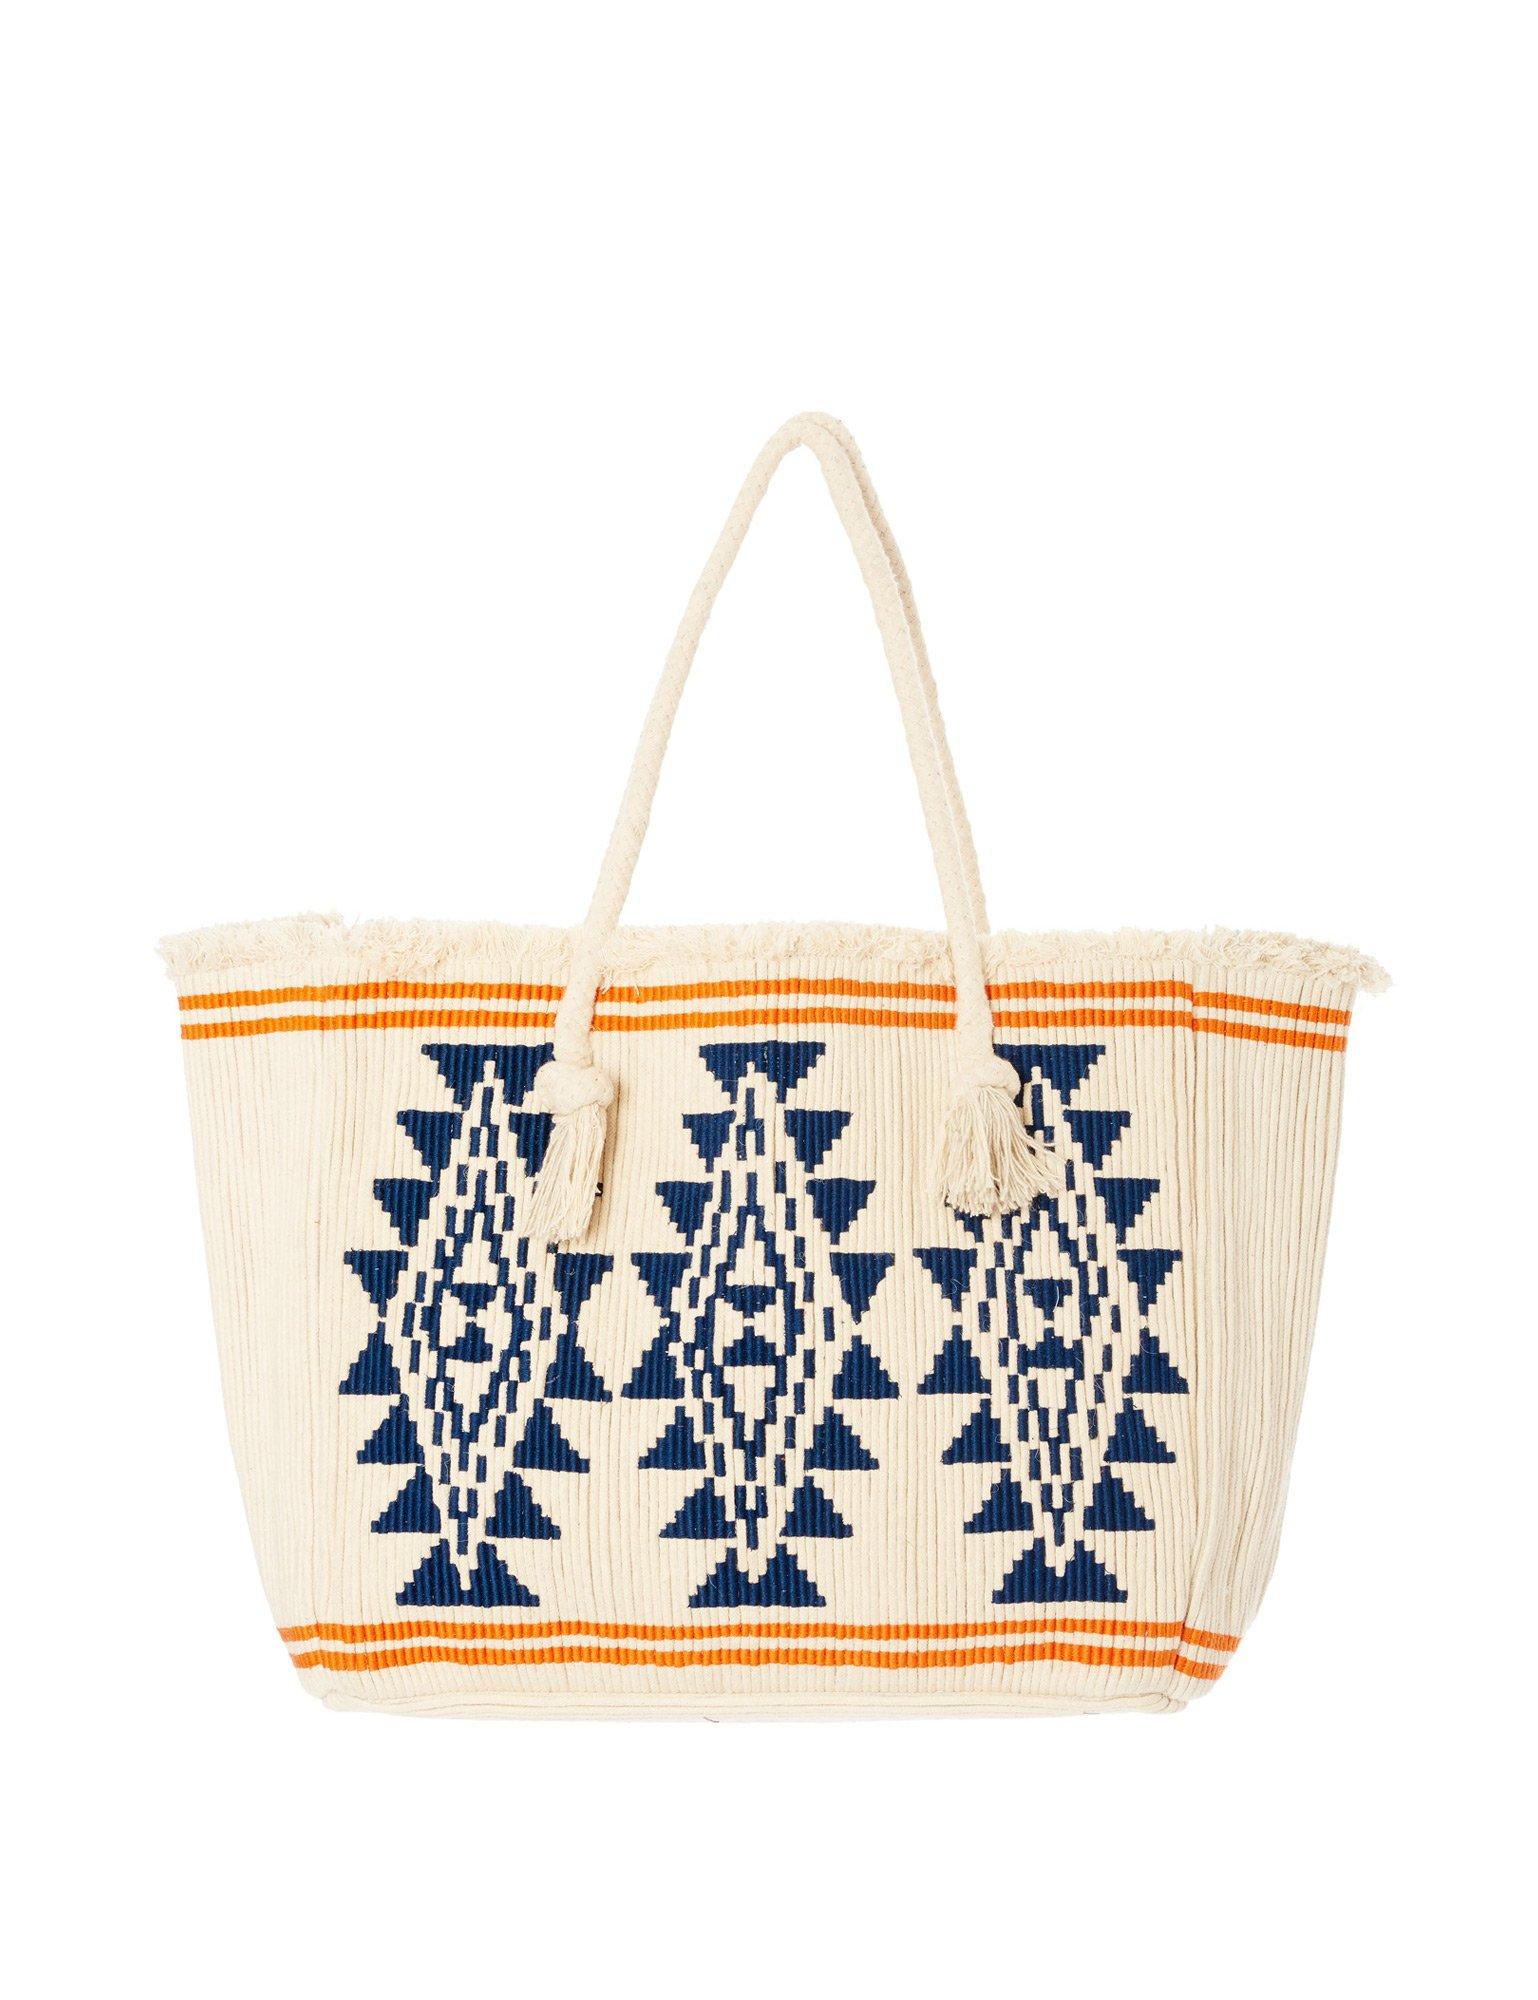 Star Mela Women's Io Women's Ivory-Navy Tote Beach Bag 100% Cotton